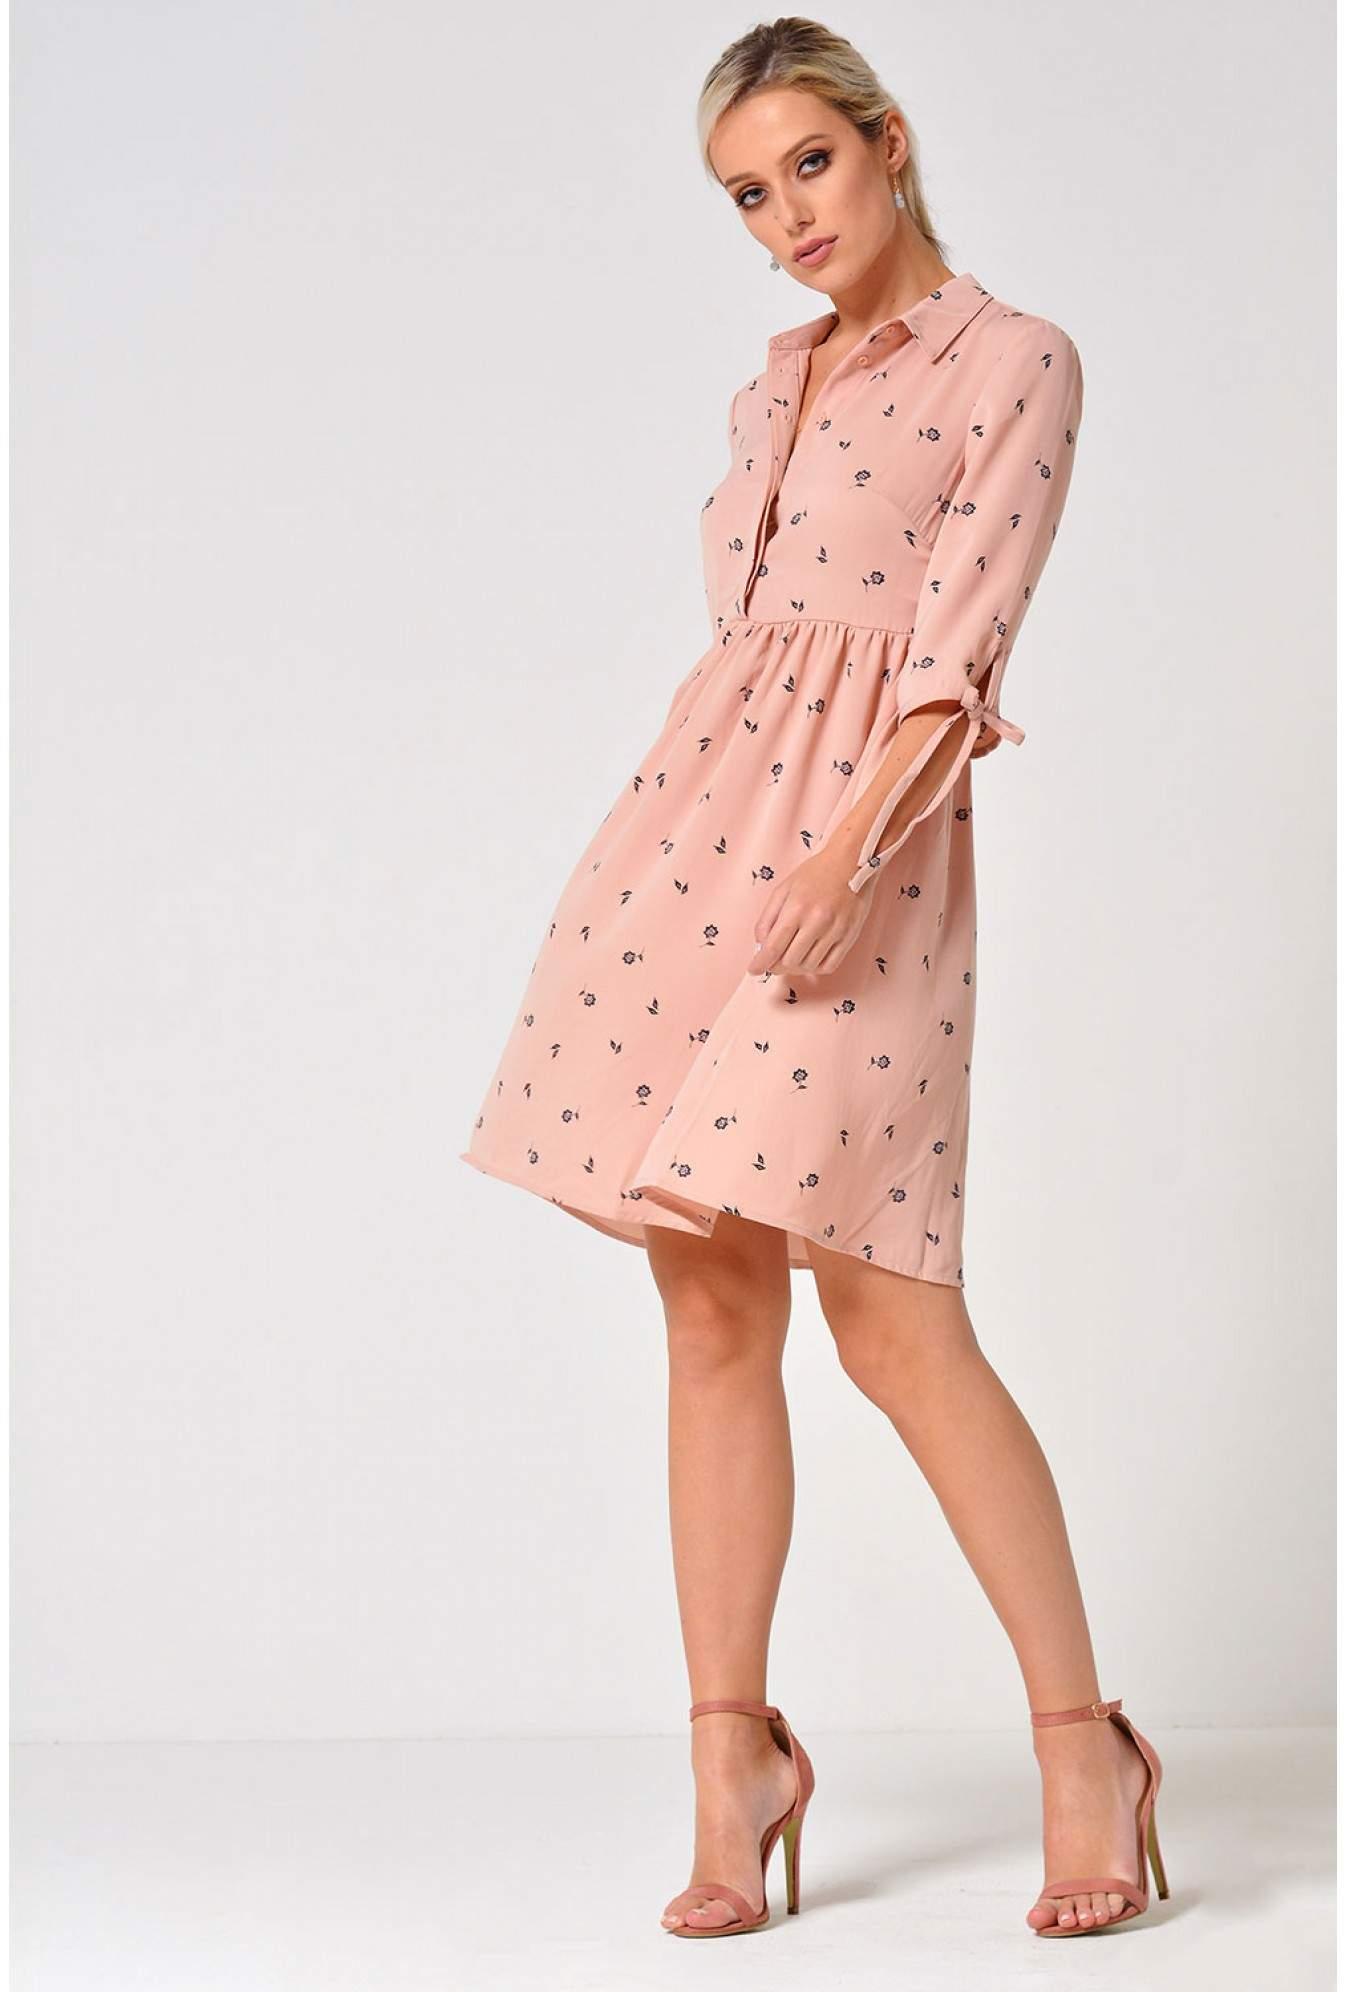 7276e6bb843a More Views. Adriana Short Dress in Blush. Vero Moda